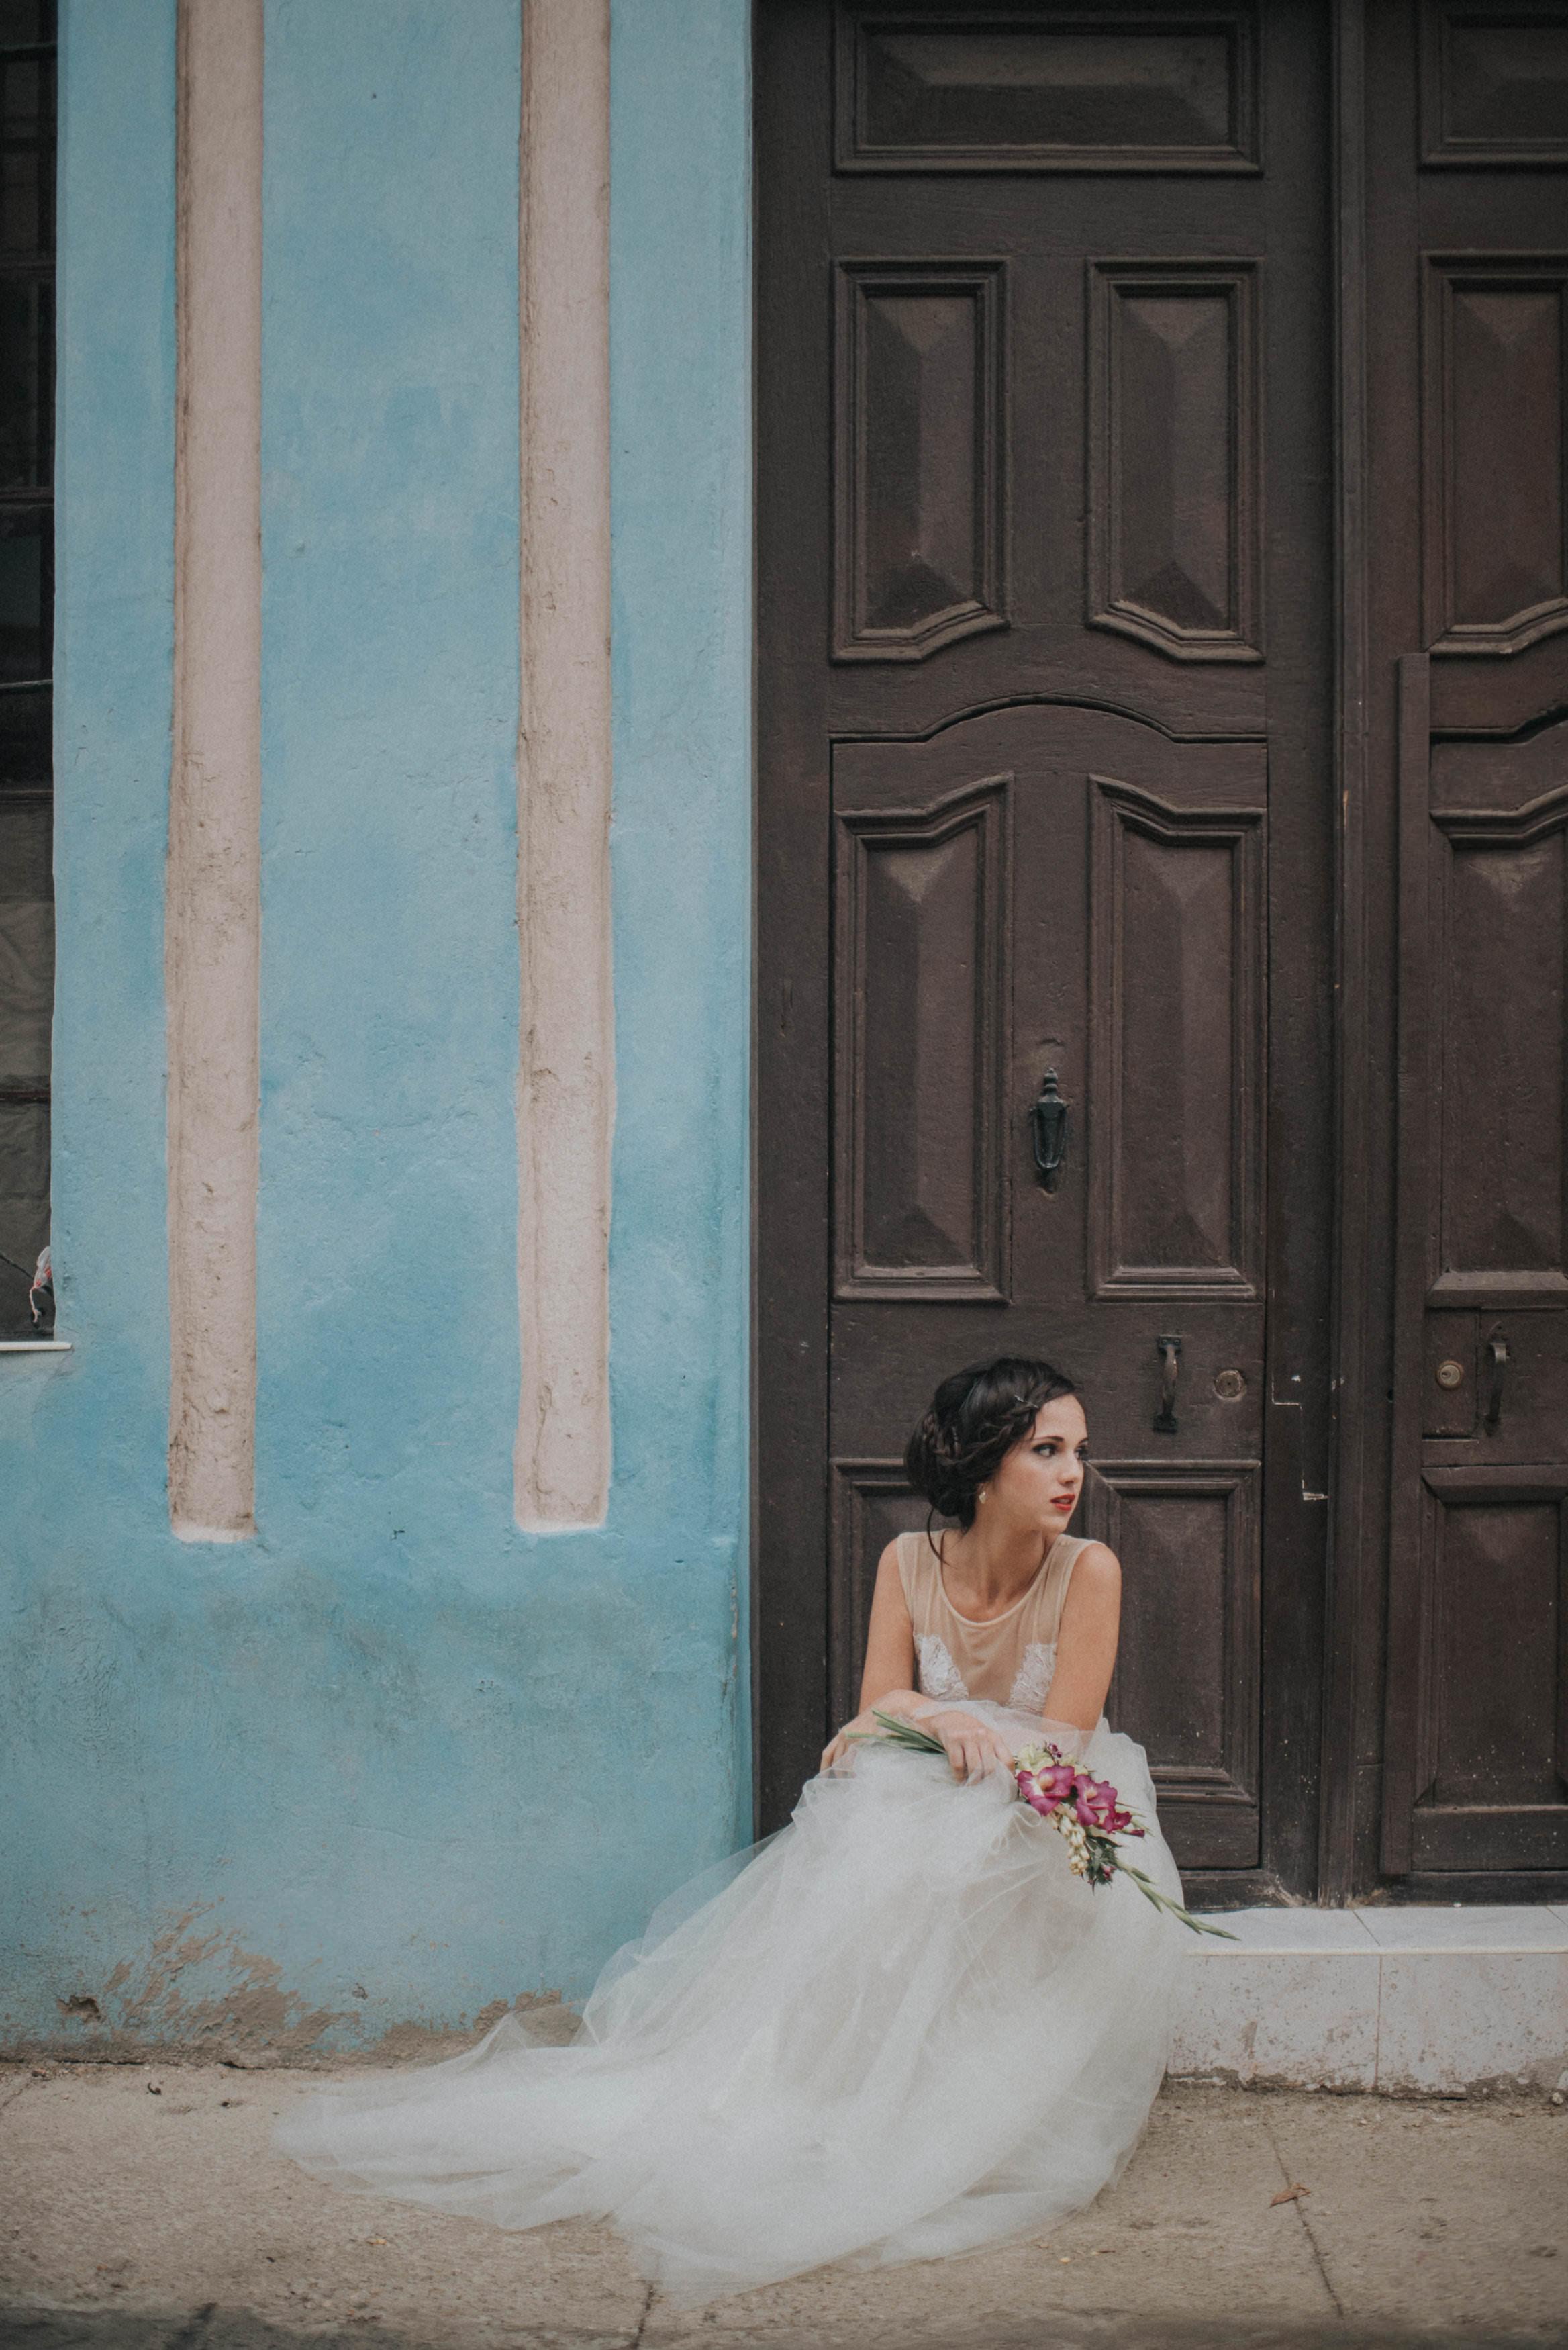 Cuba Bridals — Oxford MS Wedding Photographer   Danny K Photography